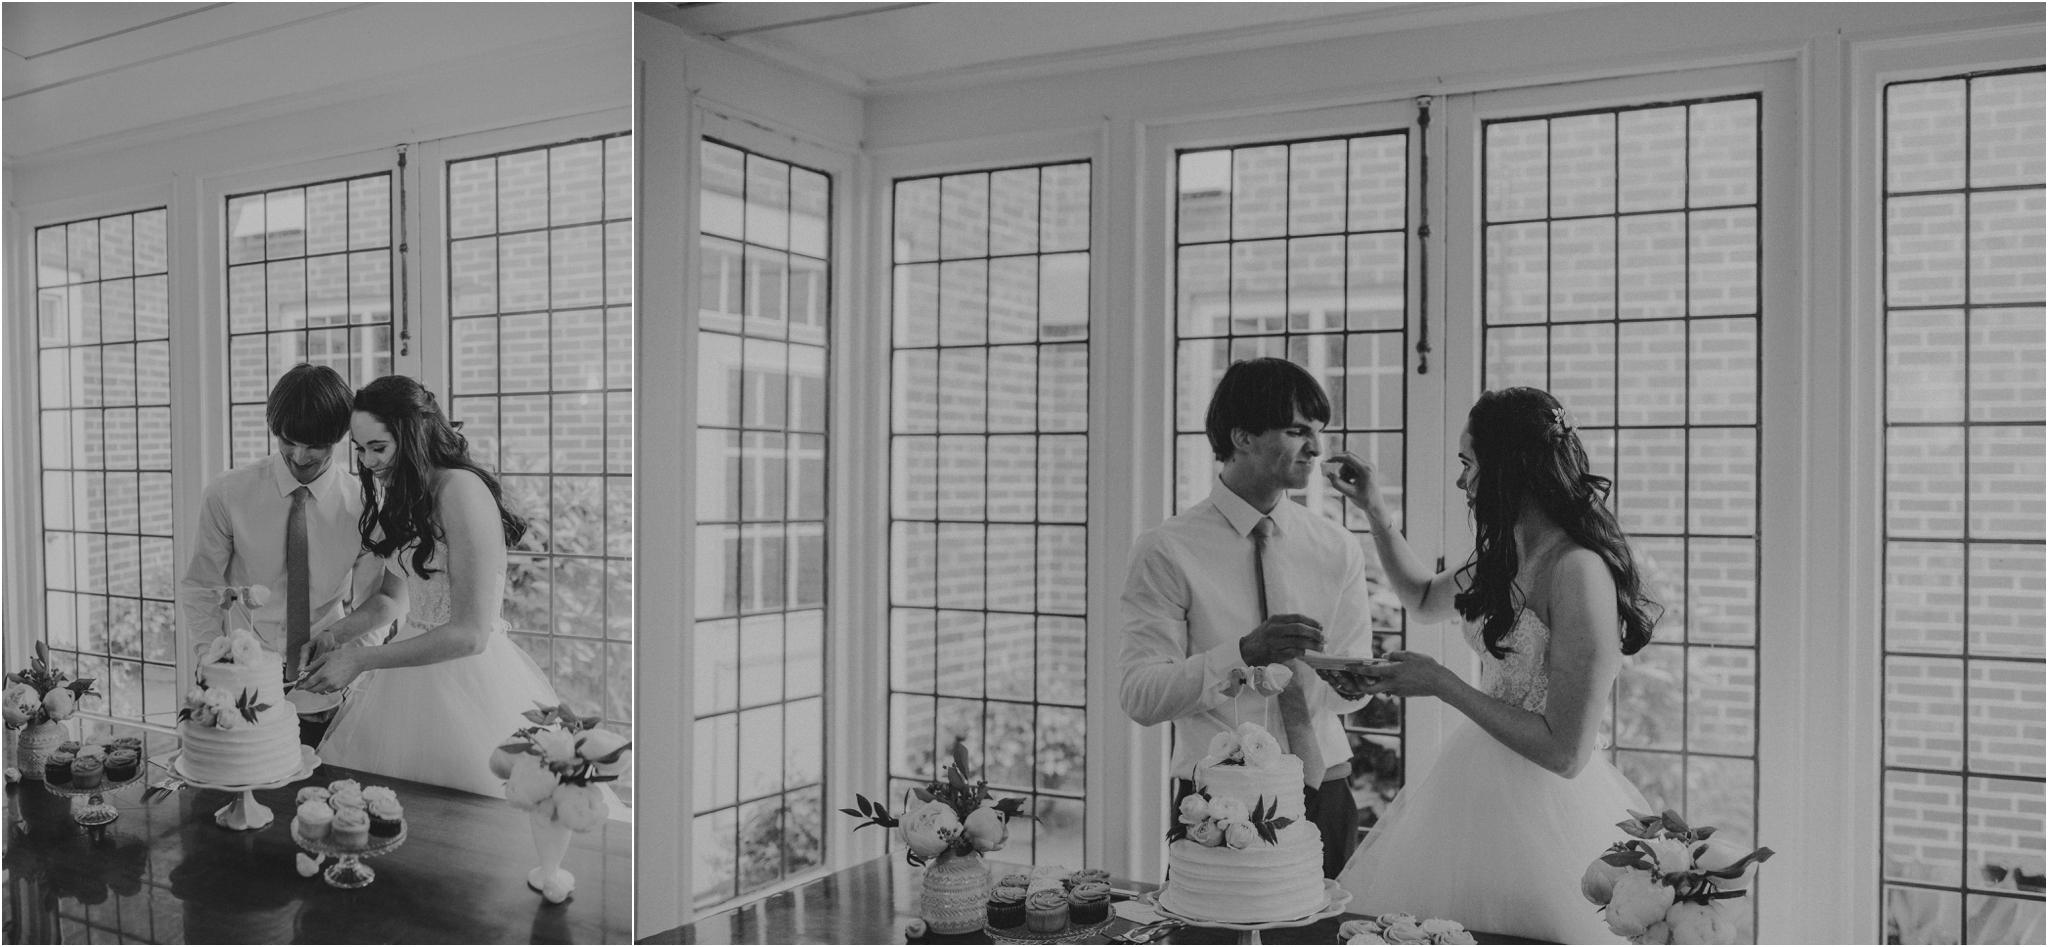 chance-and-ondrea-lairmont-manor-wedding-seattle-photographer-126.jpg